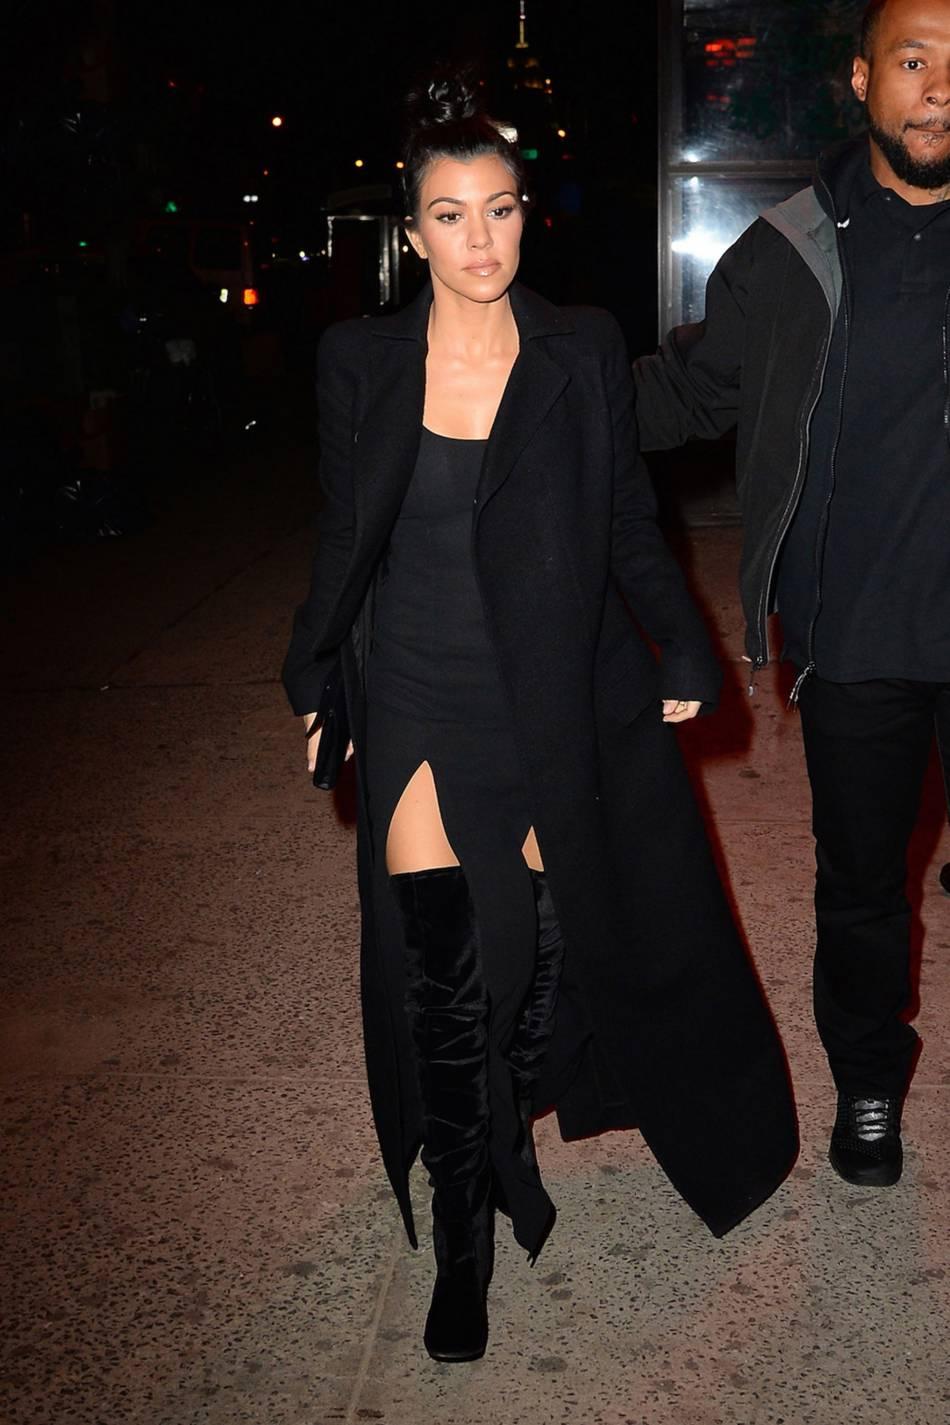 Kourtney Kardashian de sortie dans la ville de New York ce mercredi 10 février 2016.